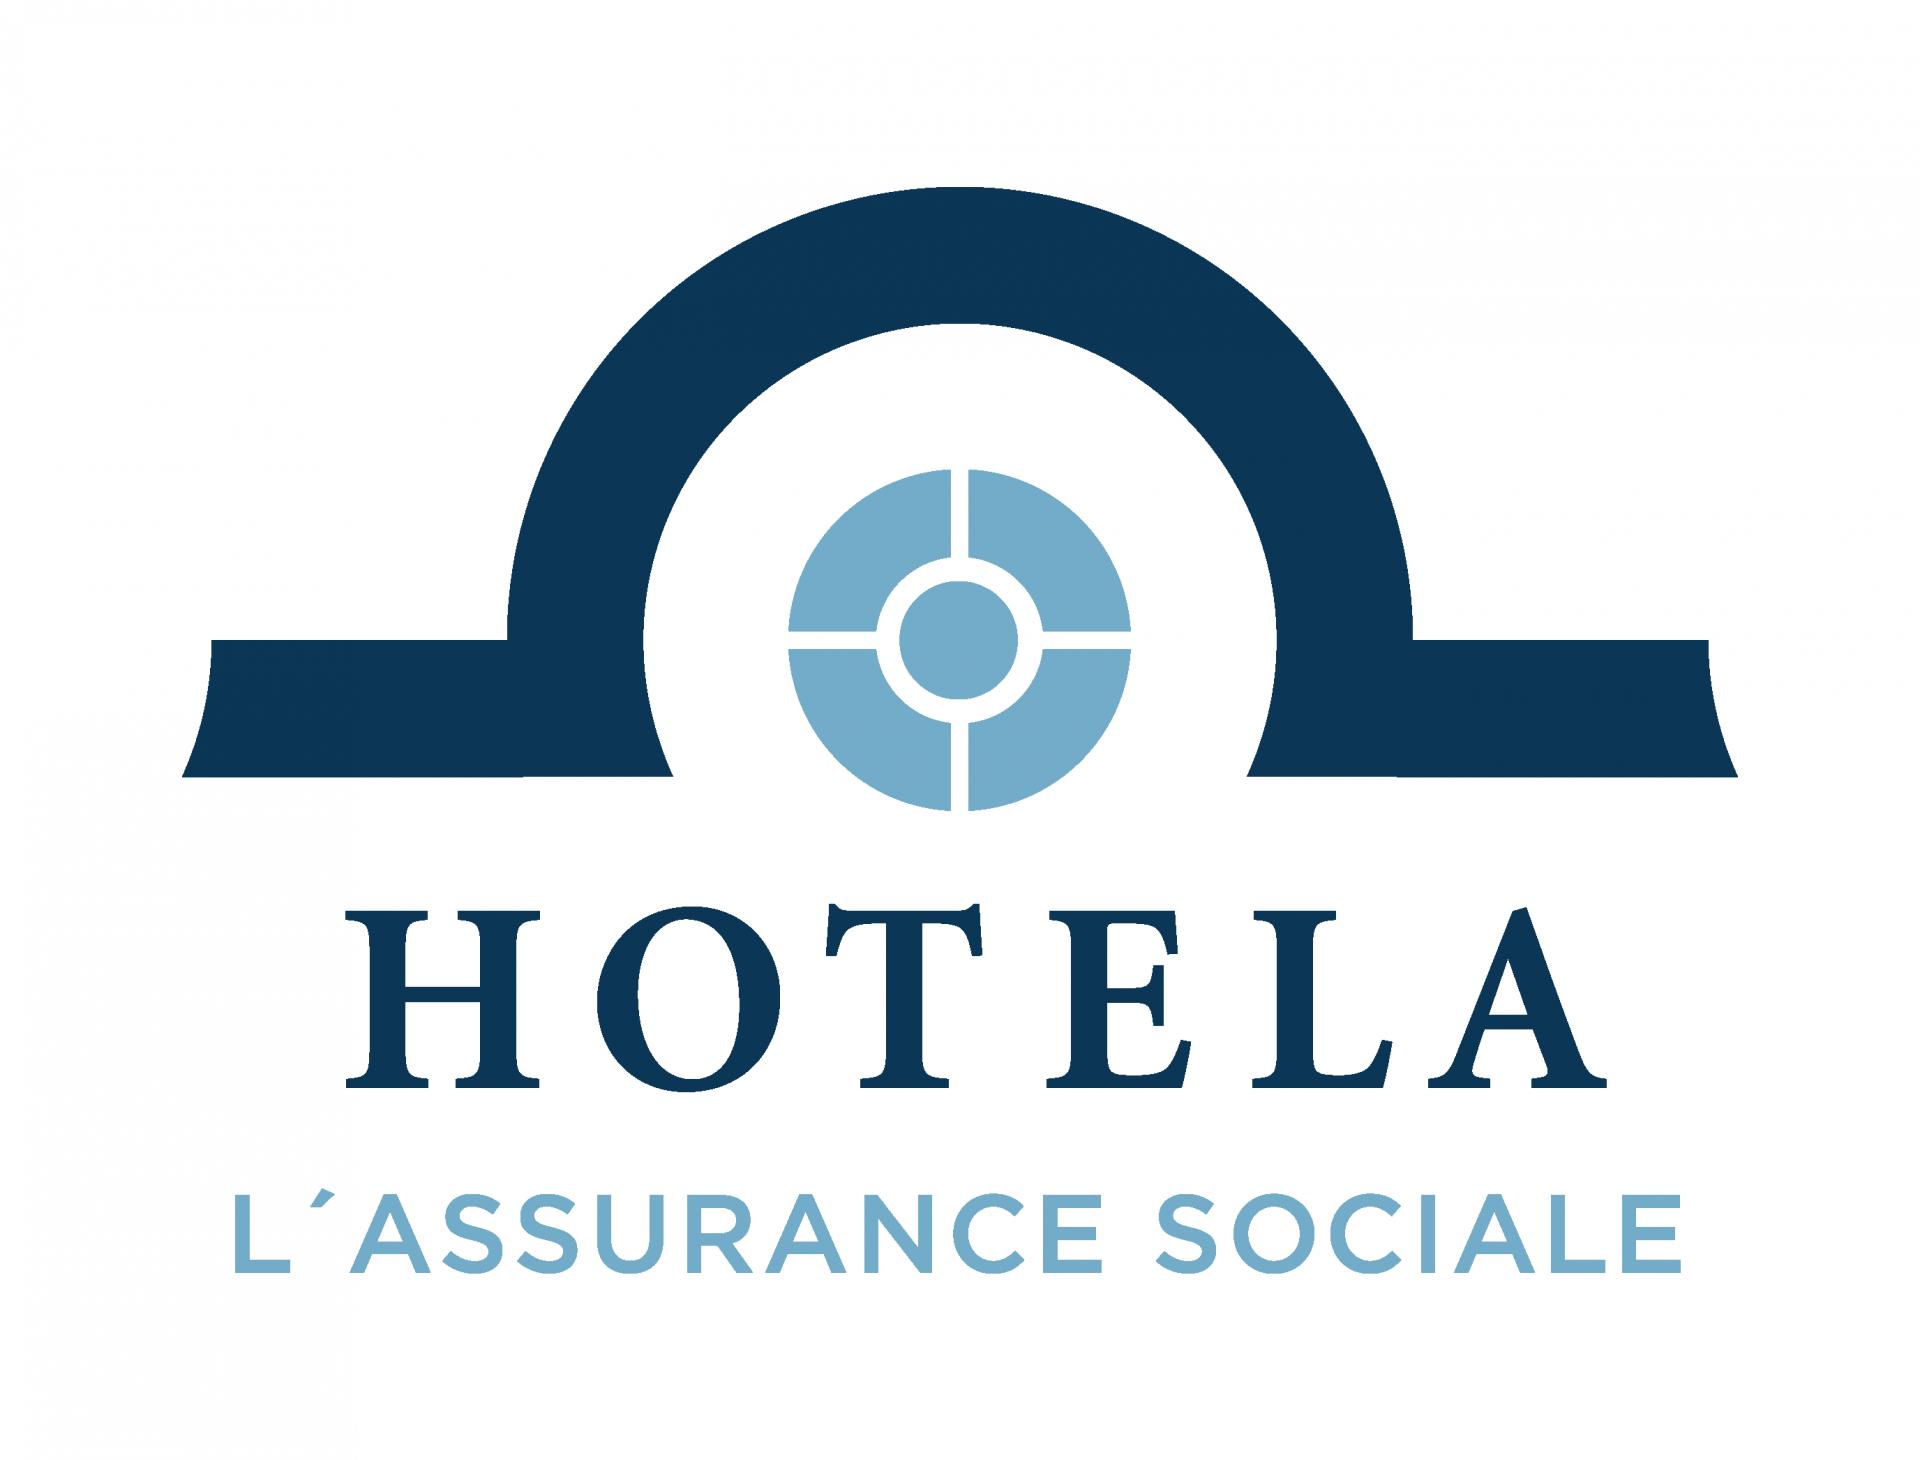 Hotela – L'assurance sociale